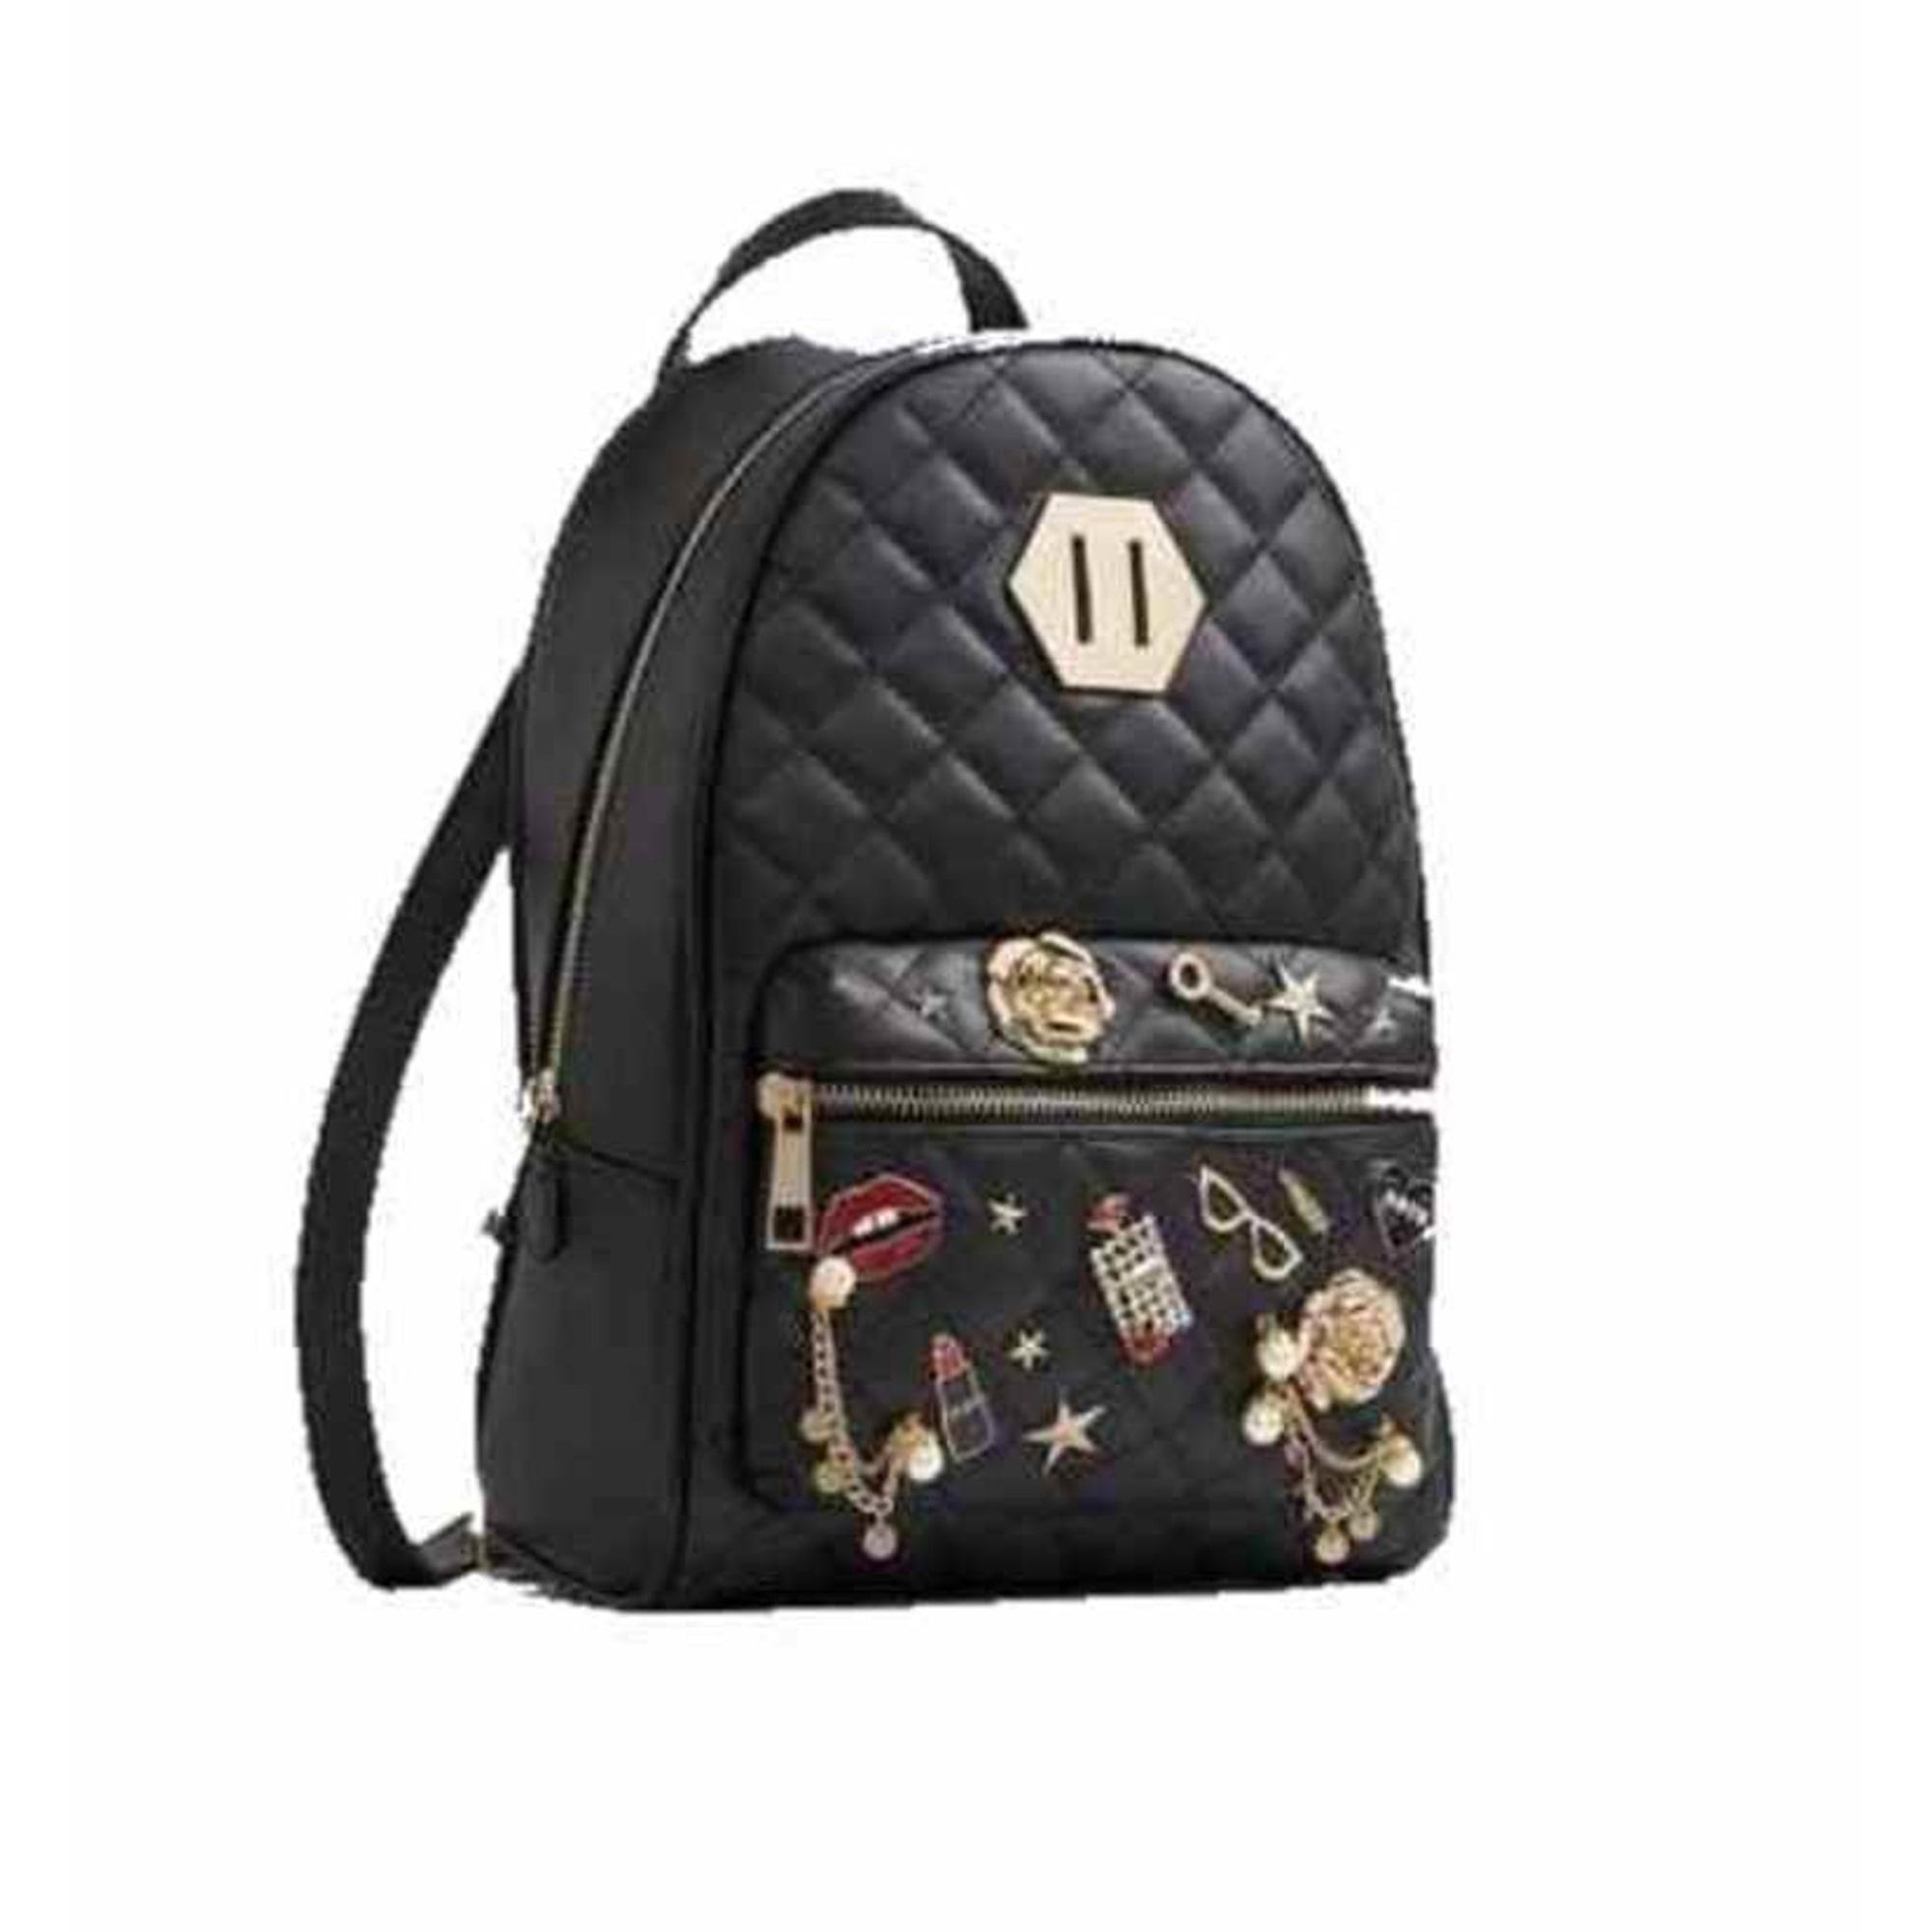 Backpack ALDO Black